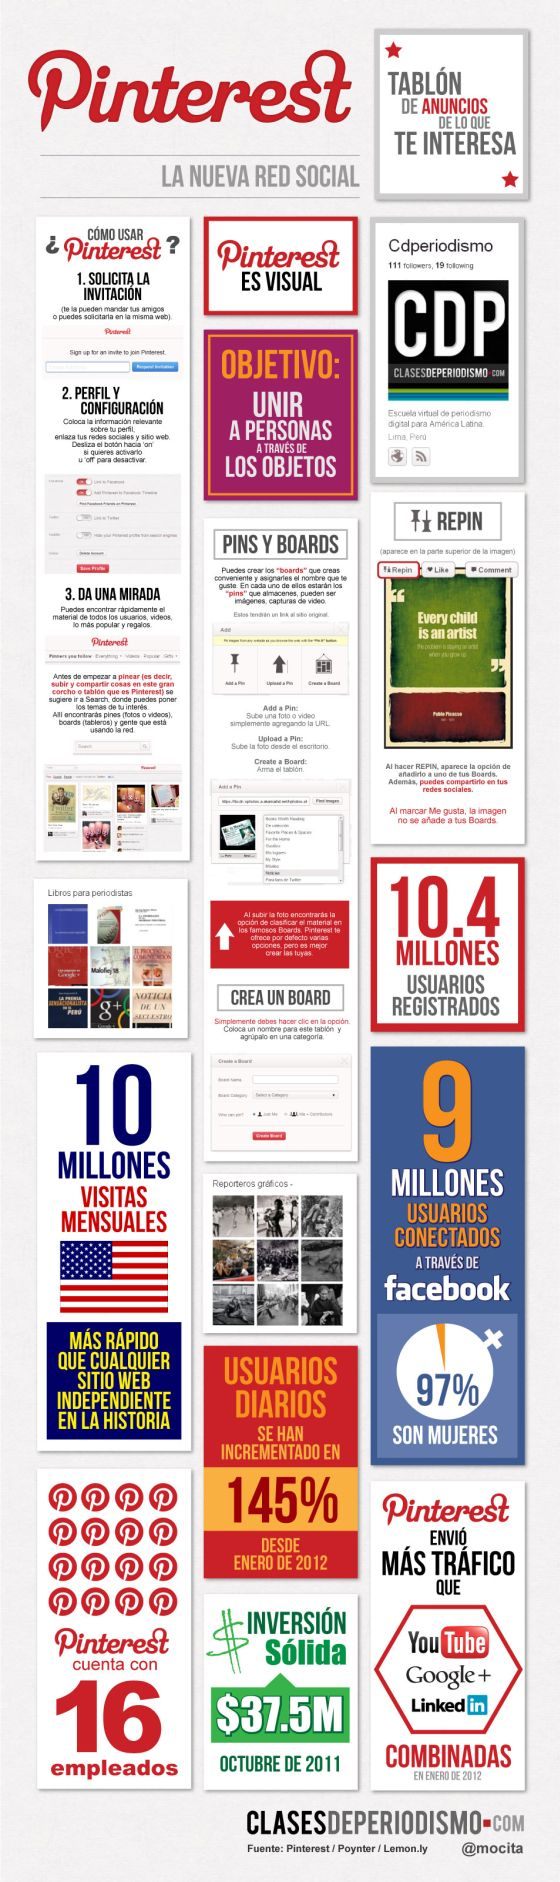 Todo lo que debes saber sobre Pinterest en una #infografia vía @cdperiodismo